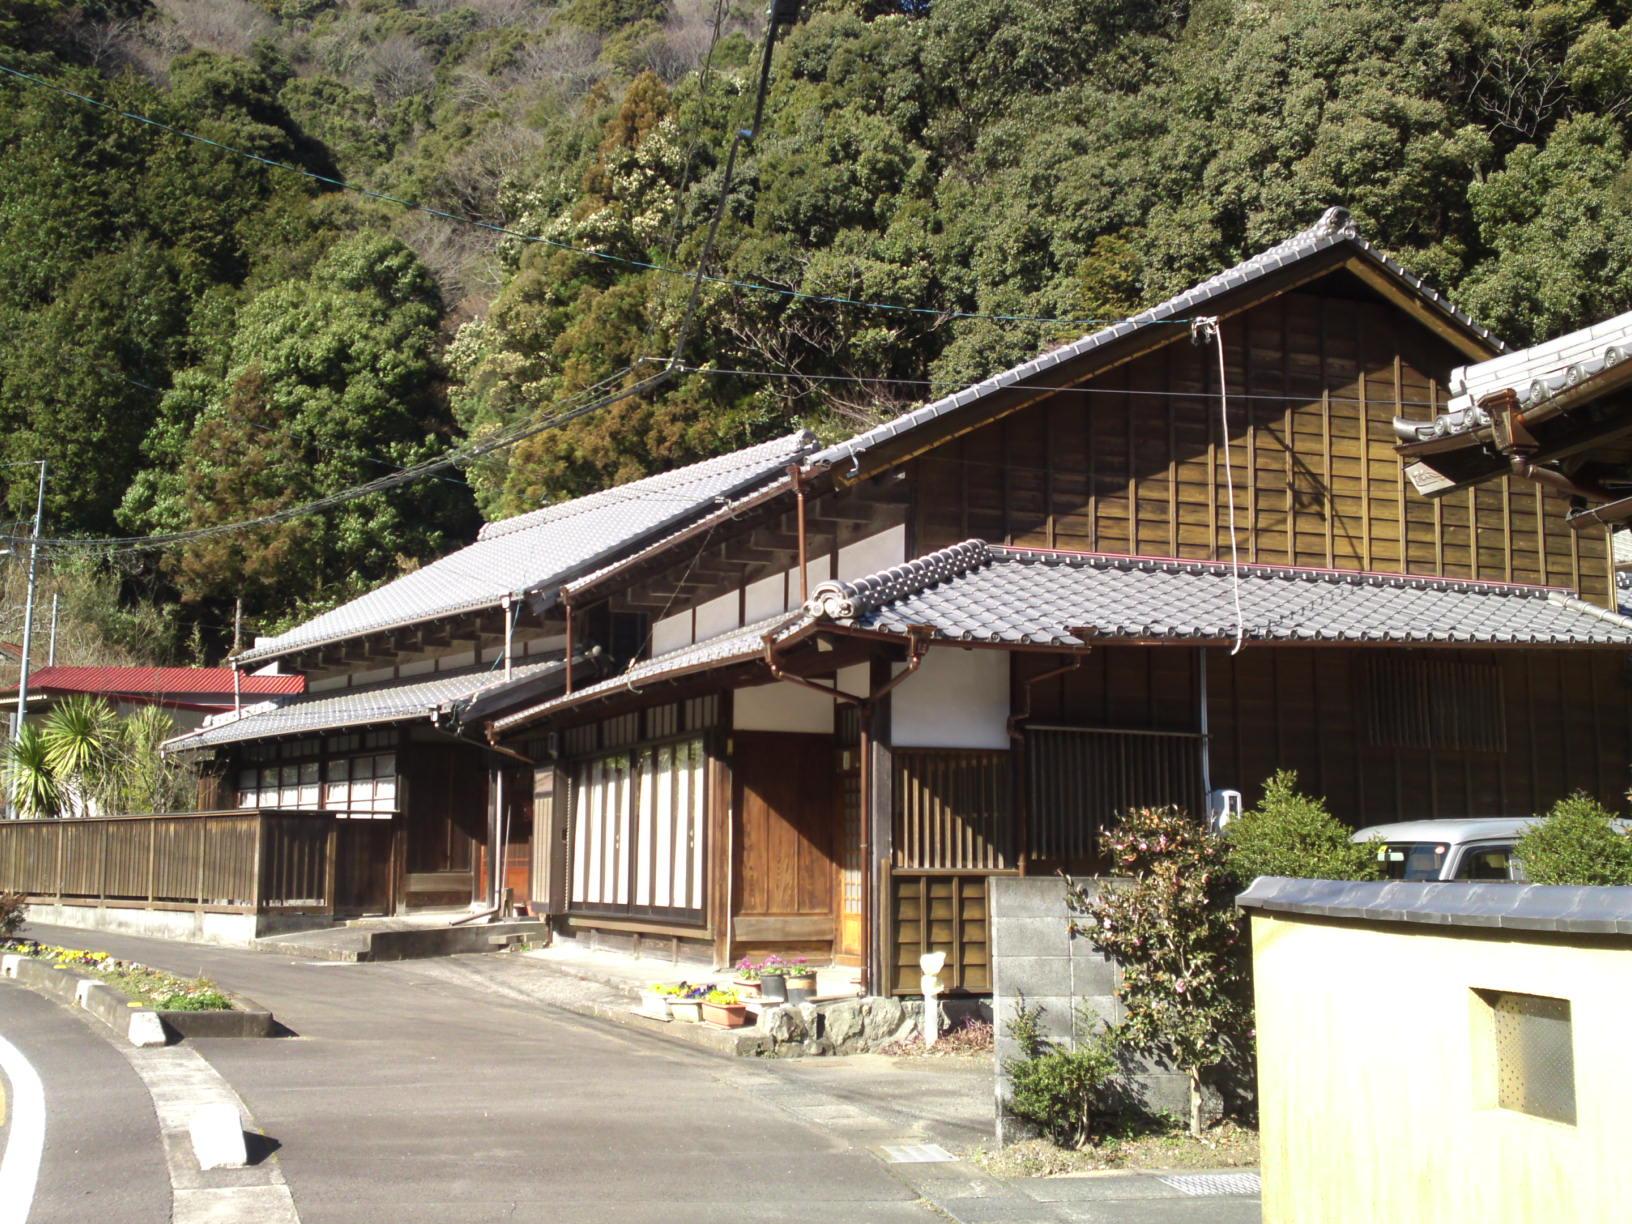 Traditional Japanese Houses and Inns in Utsunoya Shizuoka City  SHIZUOKA PICTURES